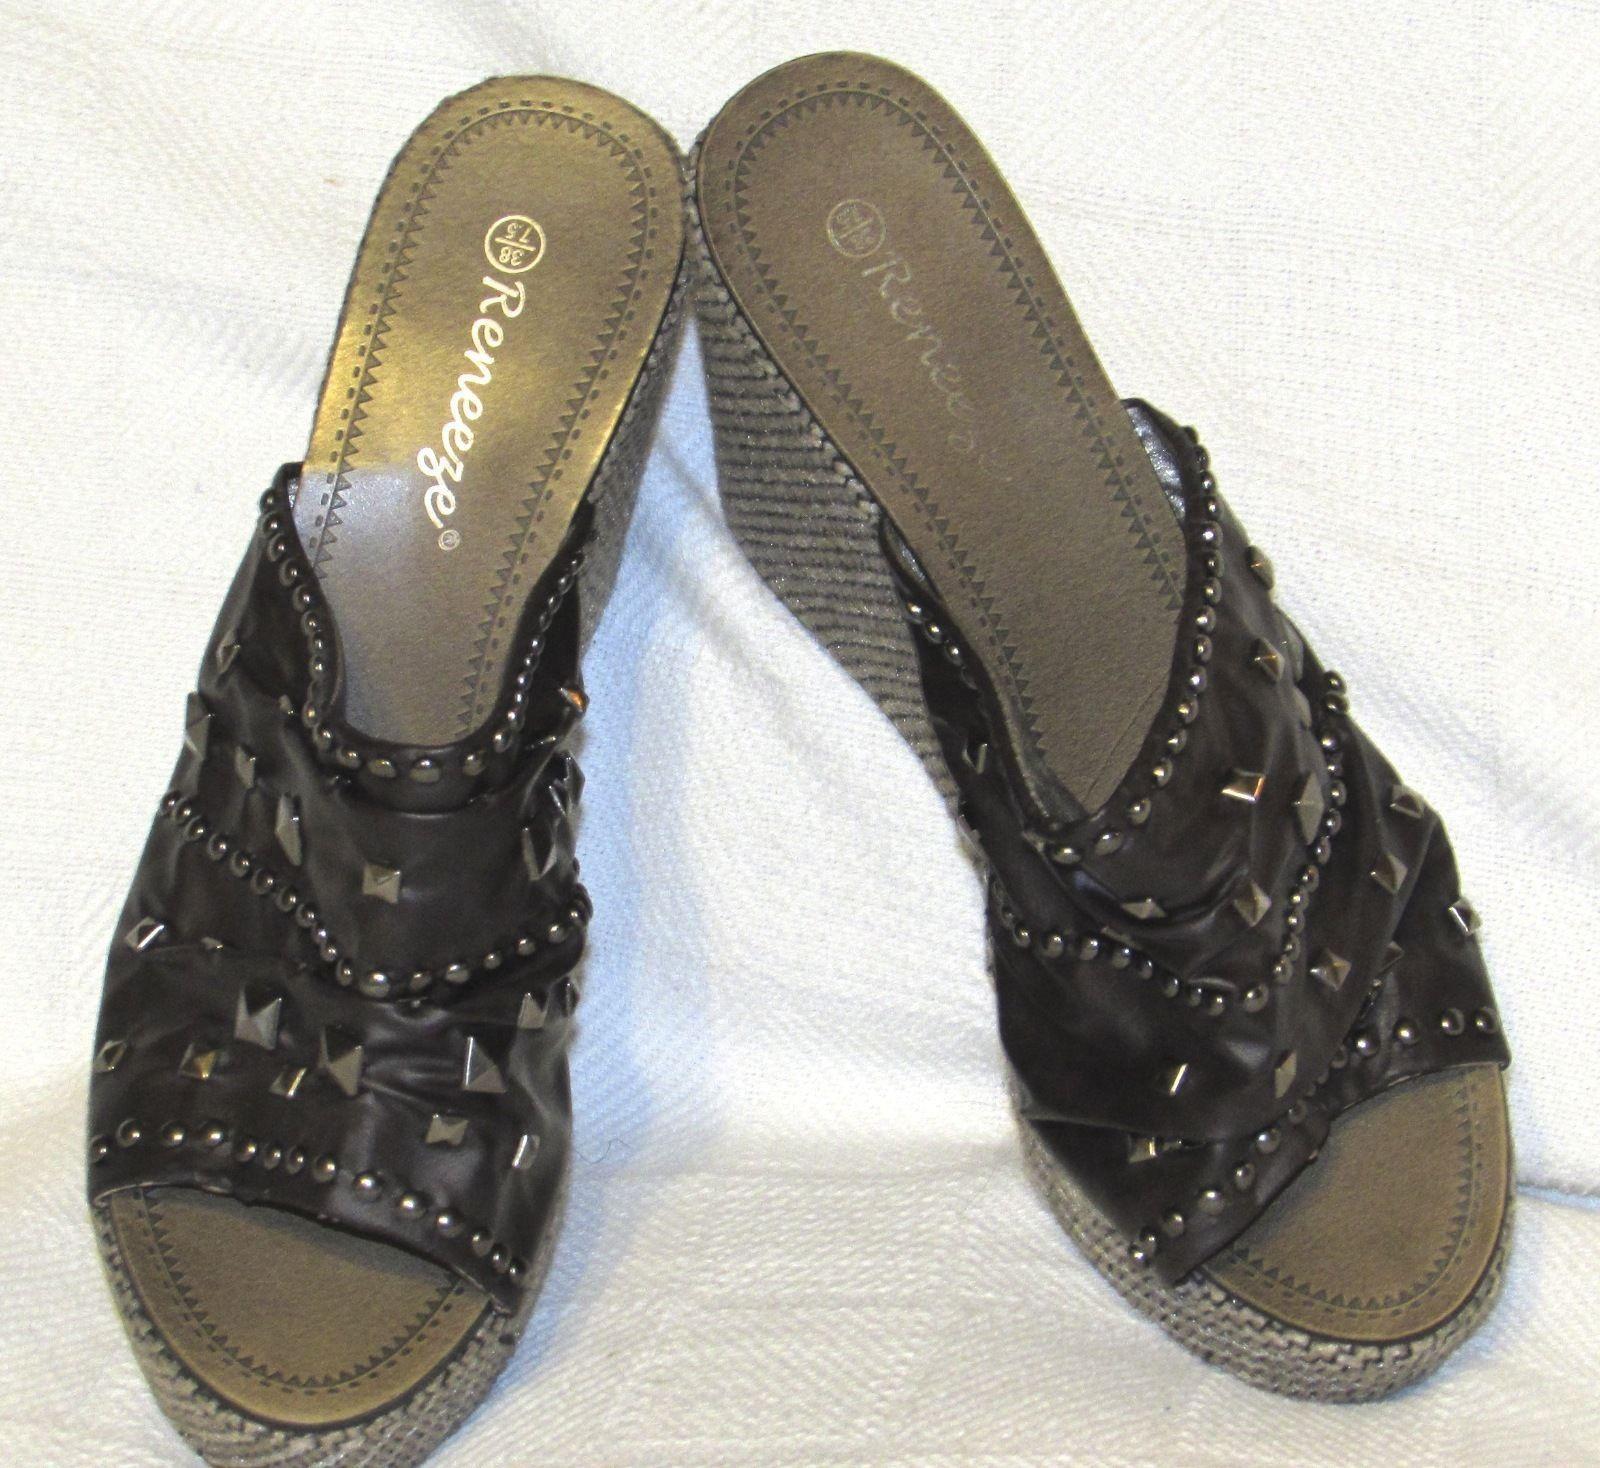 Reneeze Women's Fashion Comfort Wedge Platform Slip On Sandals Shoe S: 7.5